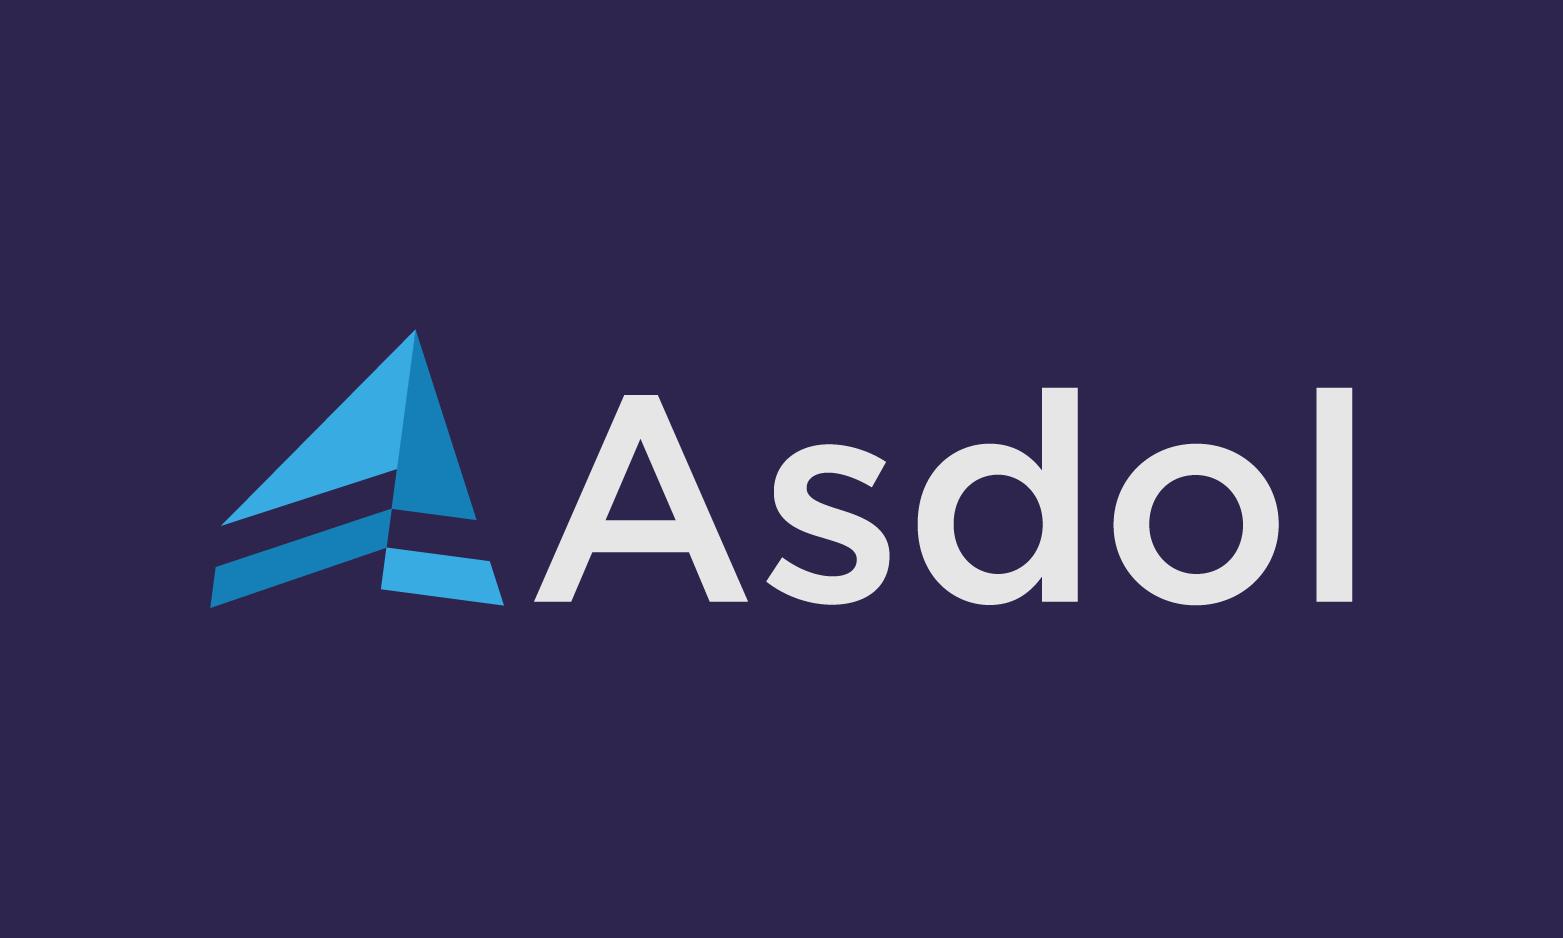 Asdol.com